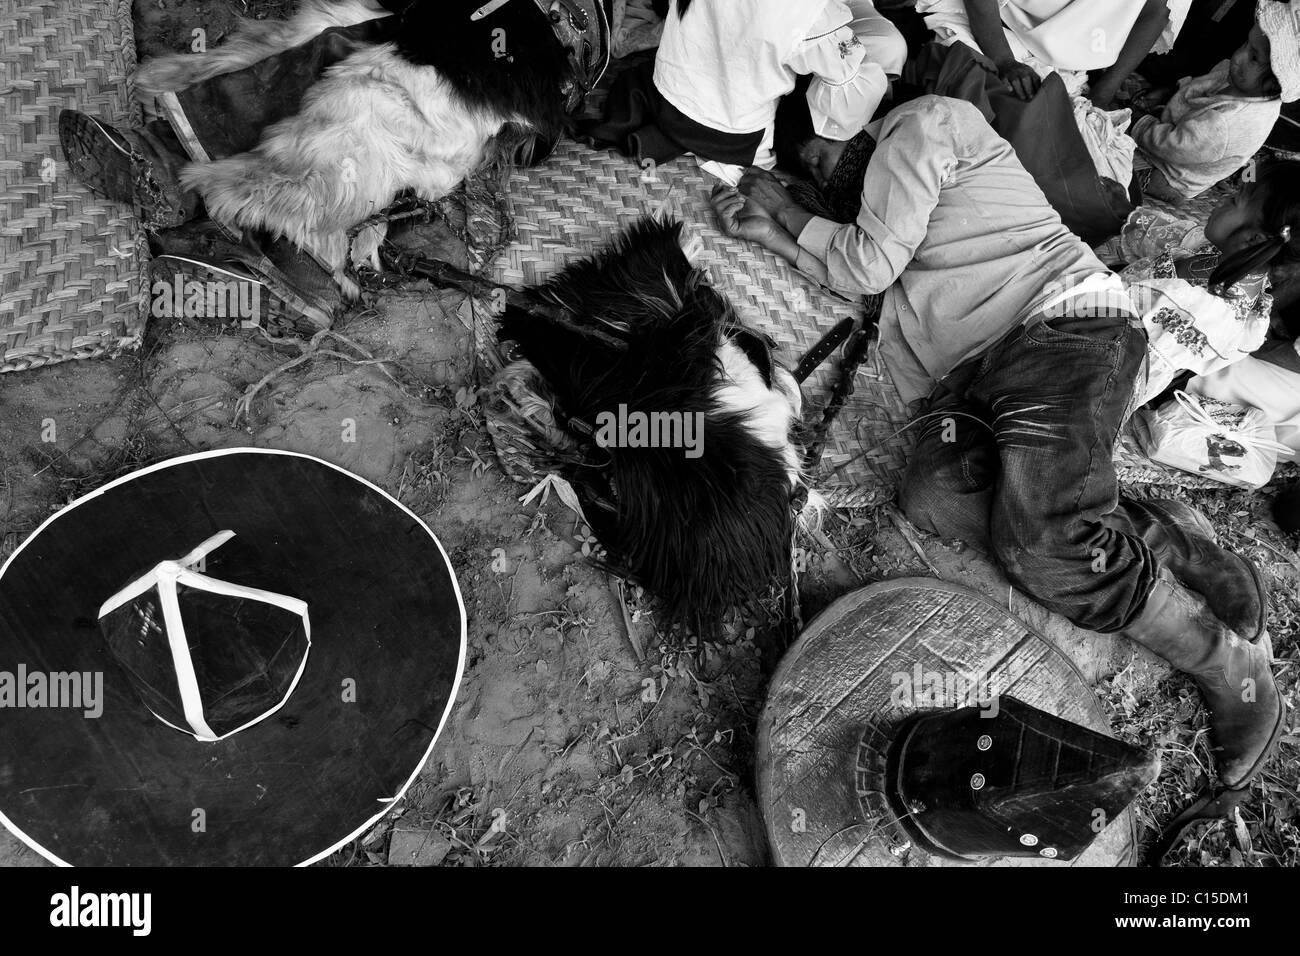 Indians, having their cardboard hats off, sleep on the floor during the Inti Raymi (San Juan) festivities in Cotacachi, - Stock Image